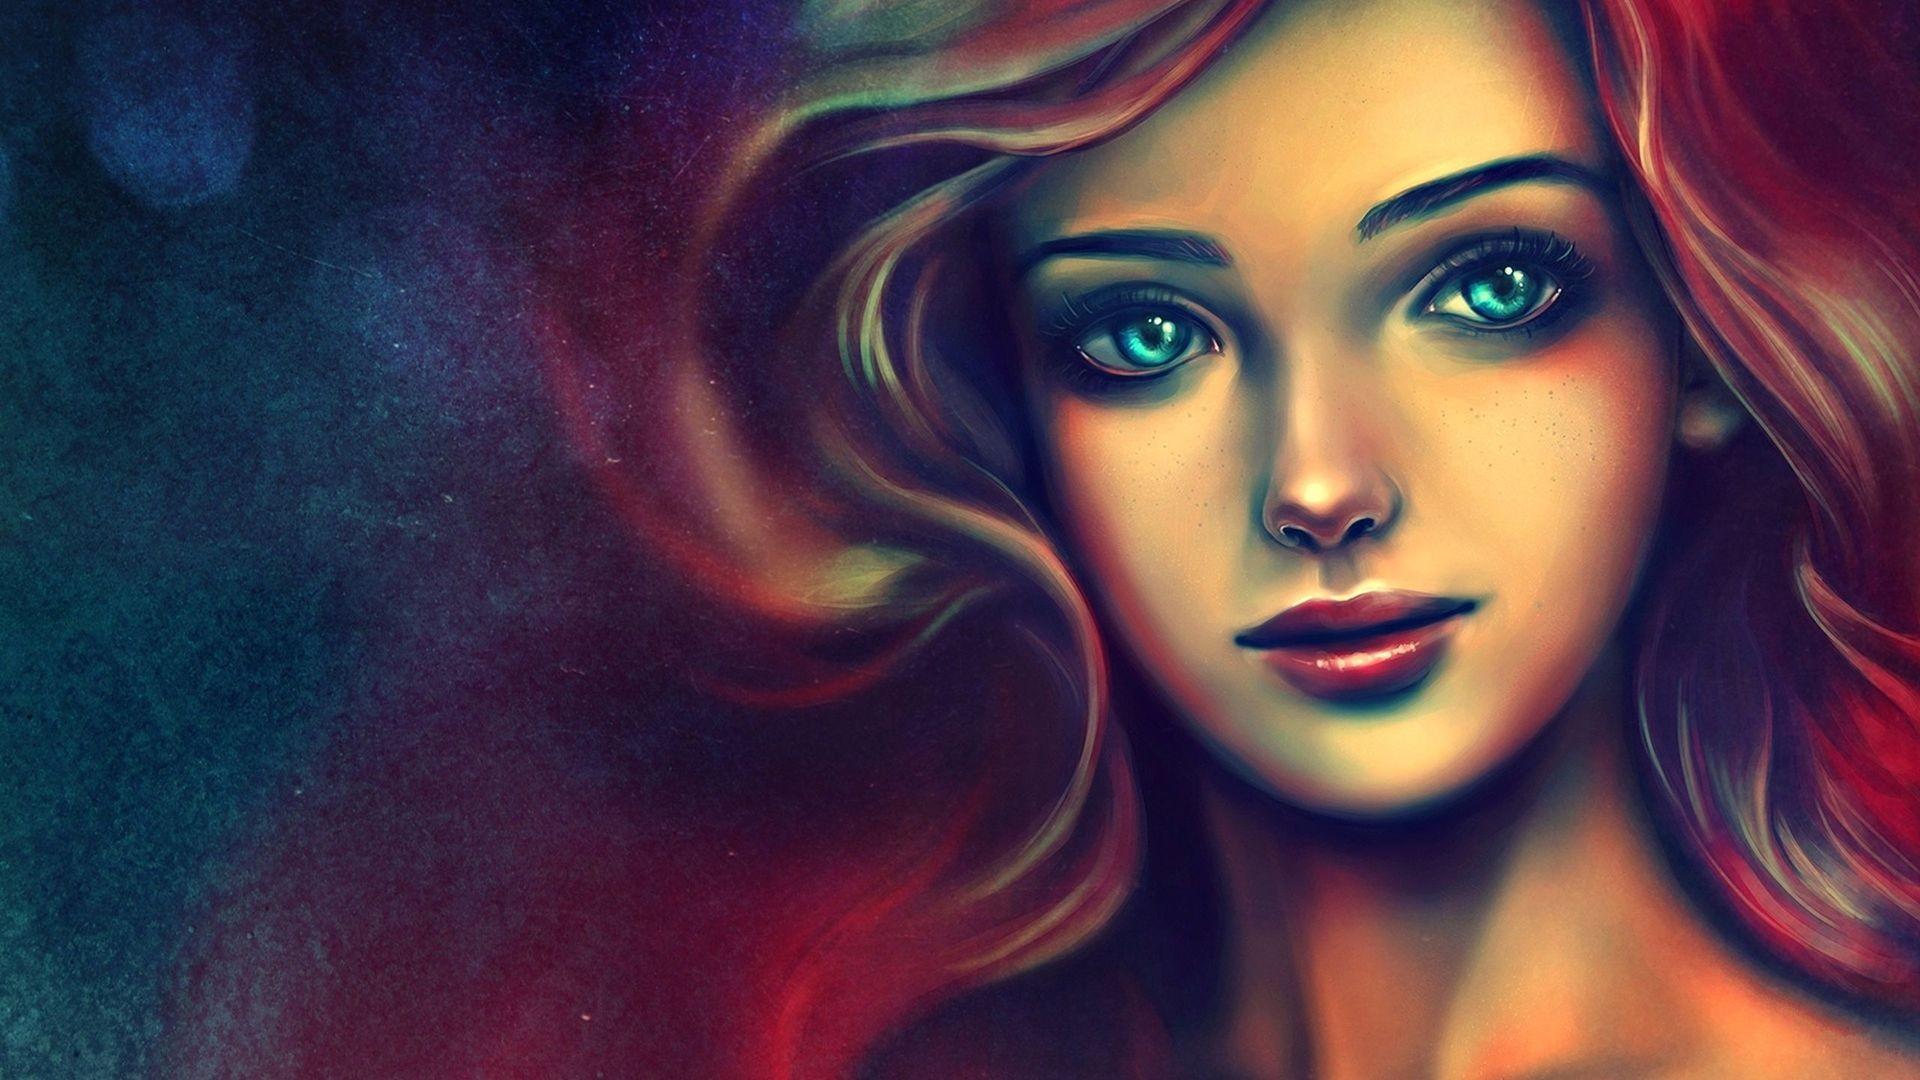 Fond d 39 cran visage dessin color illustration - Dessin colore ...